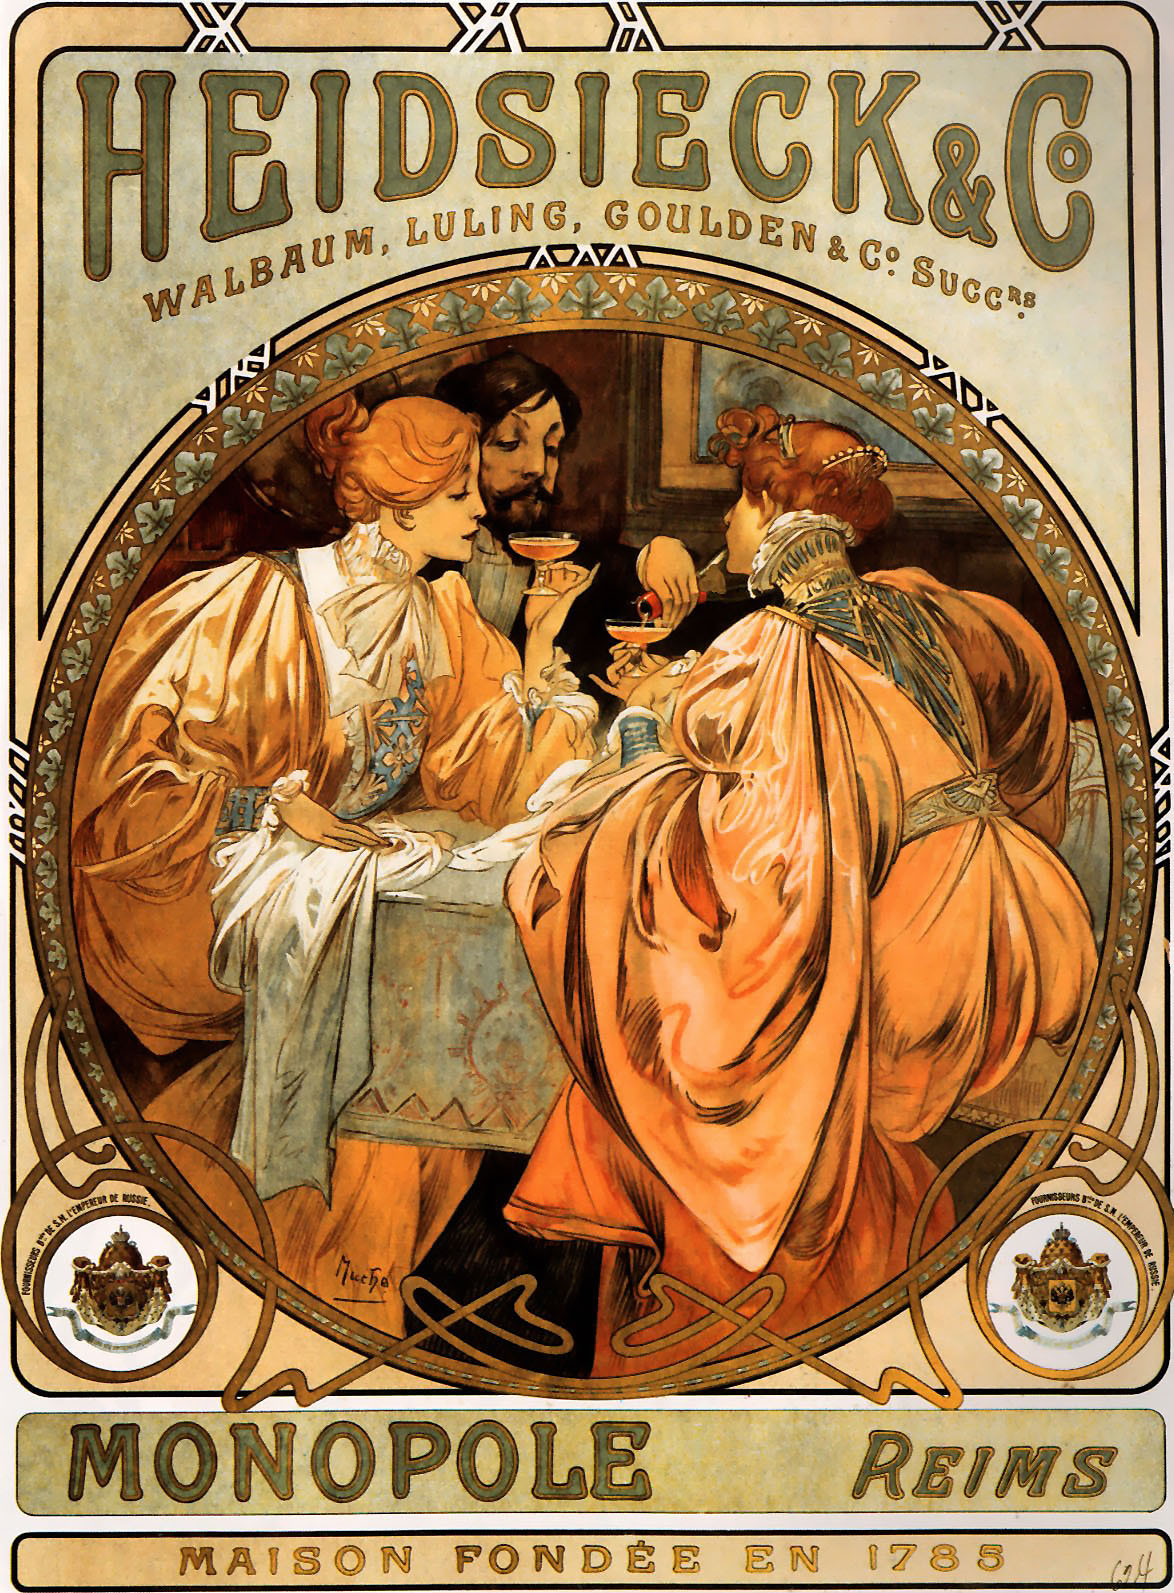 Heidsieck and Co Monopole